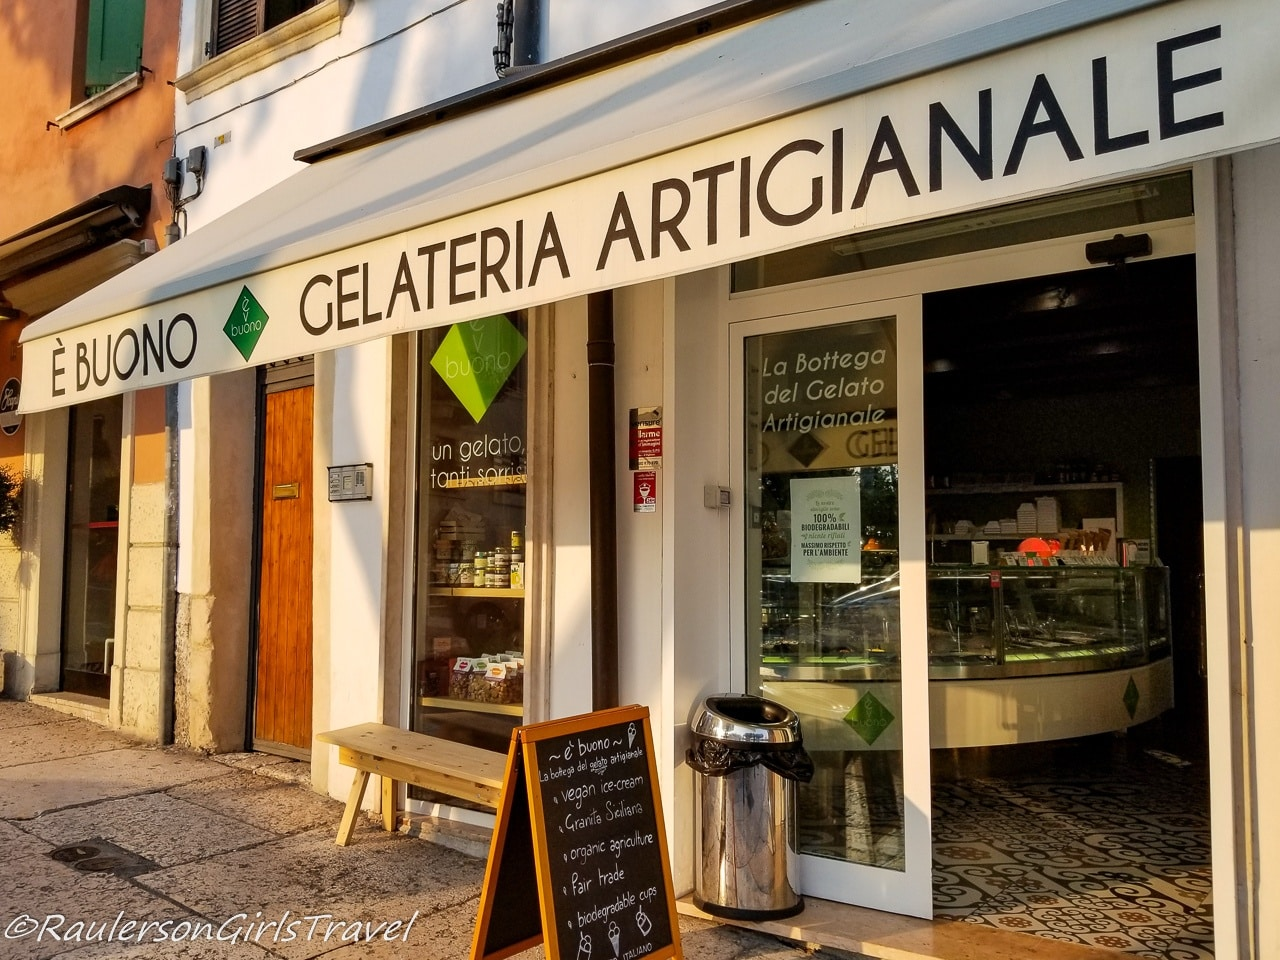 È Buono Verona - Gelateria Artigianale